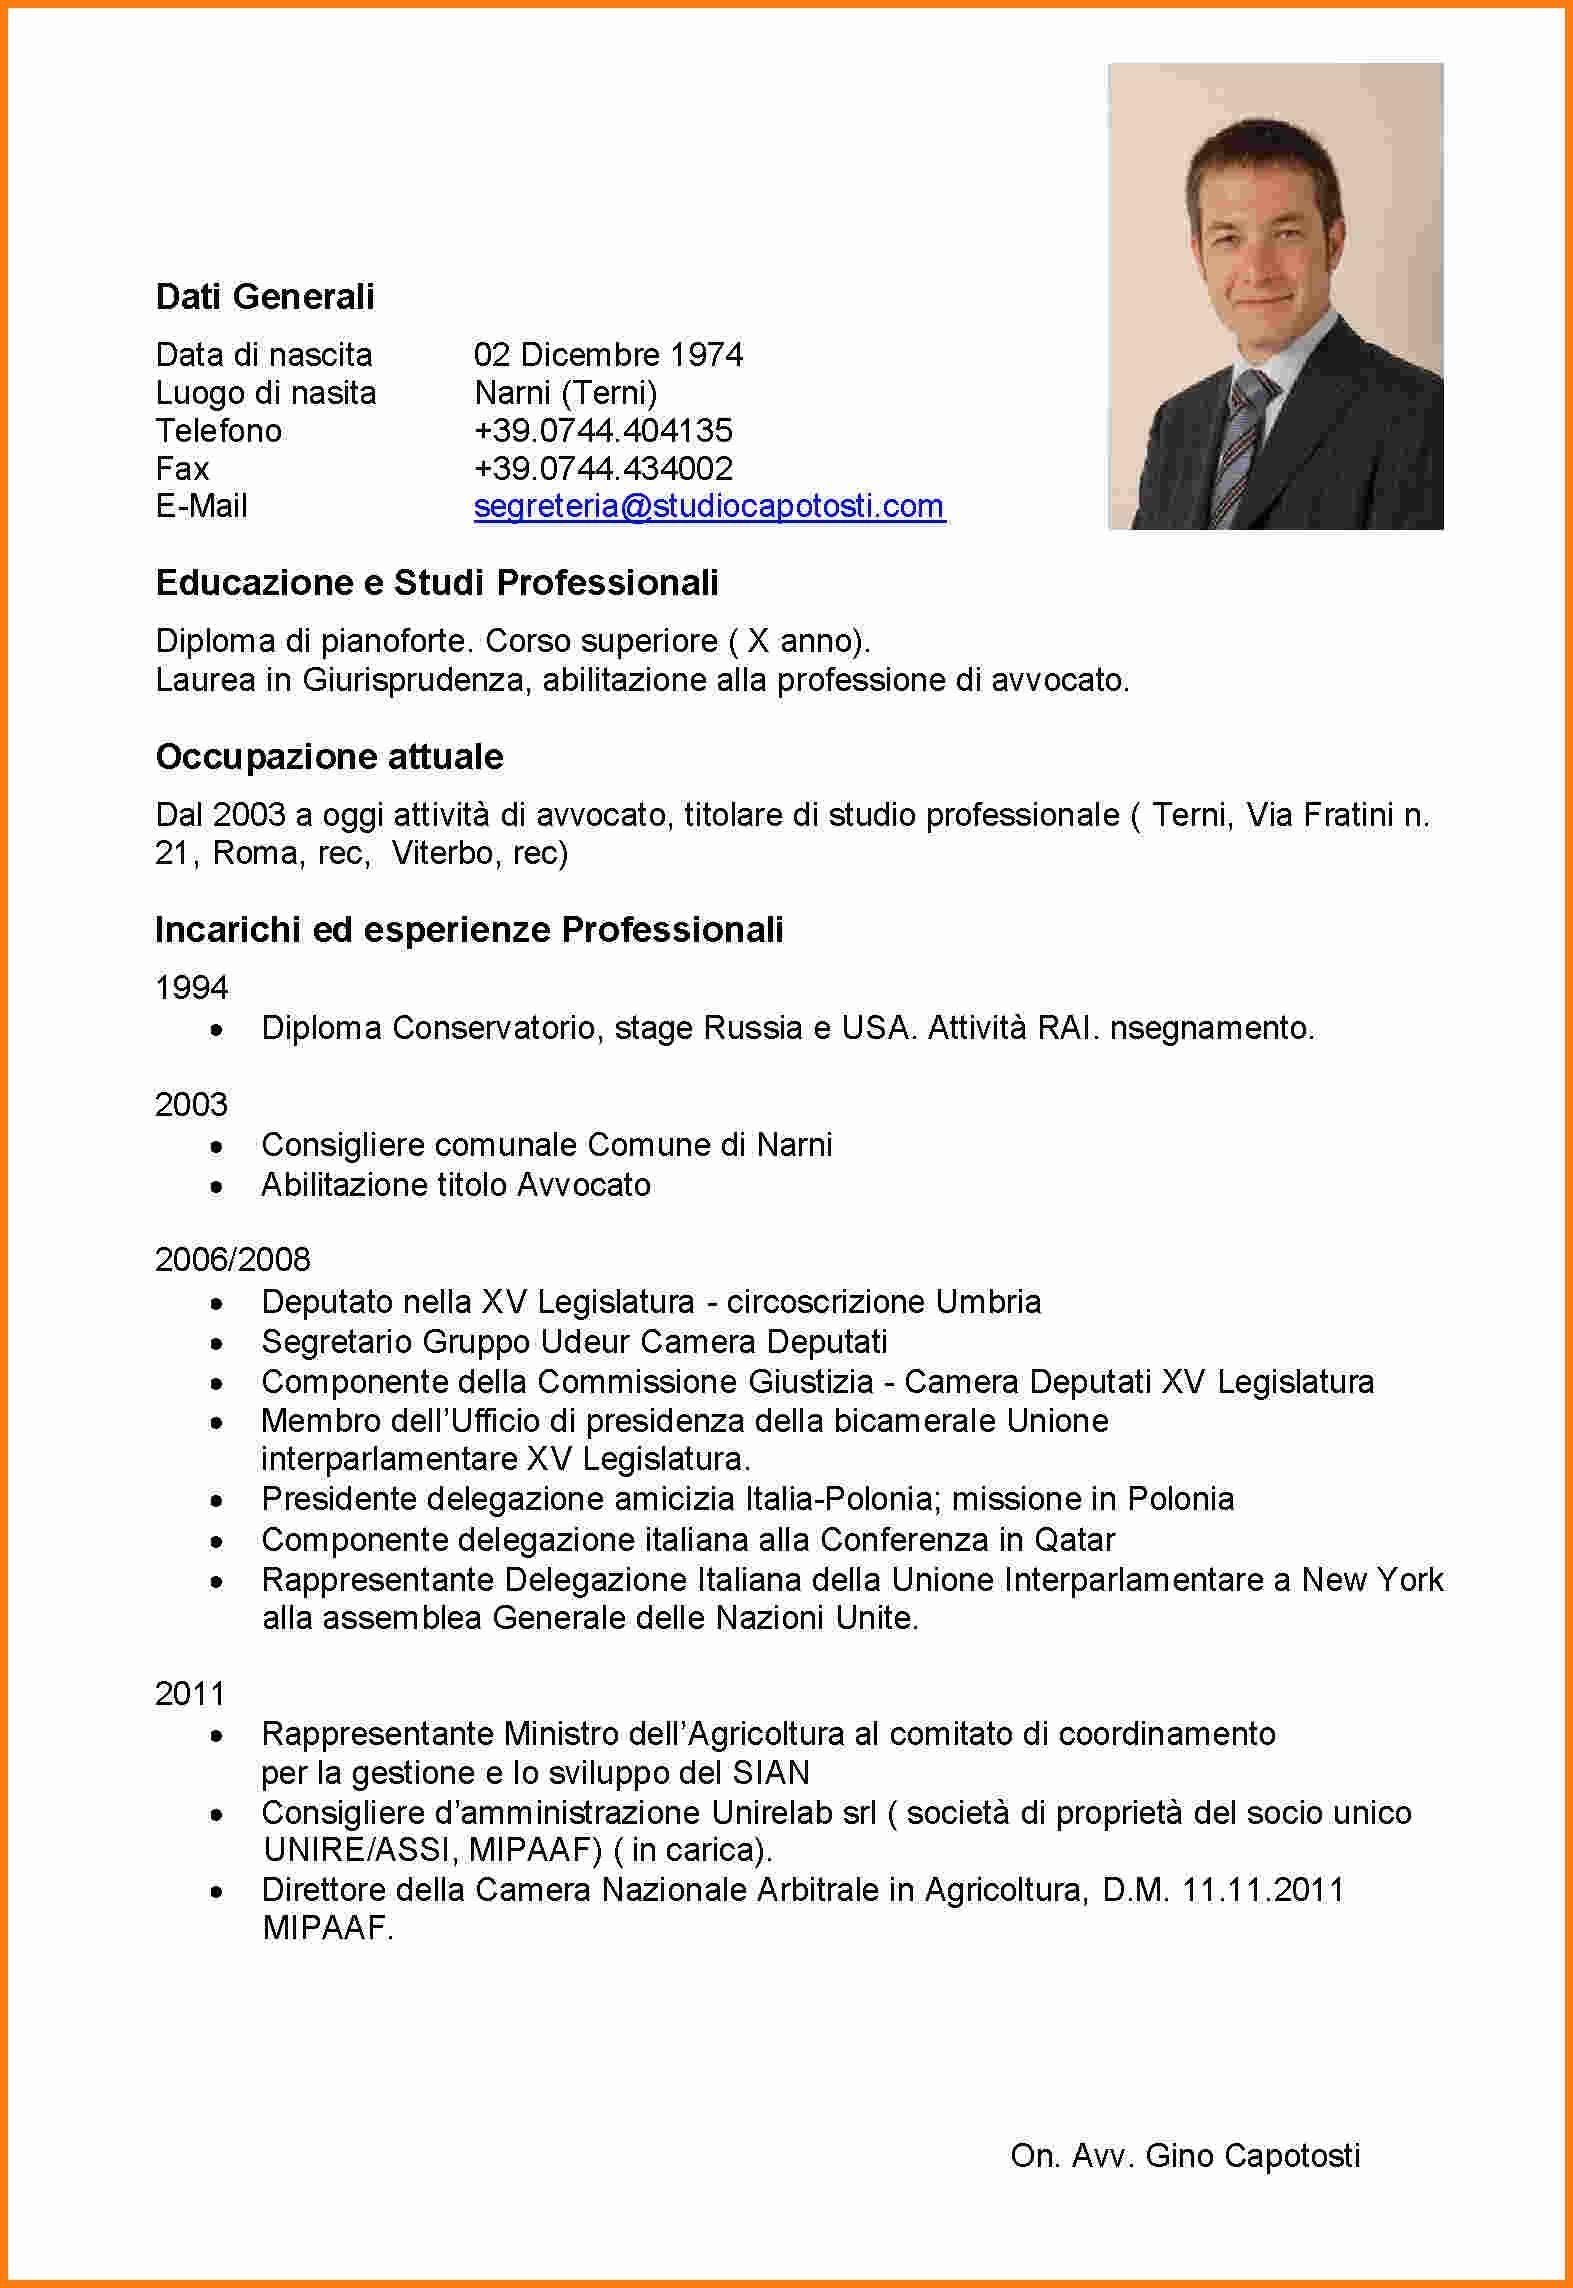 Resume Format Qatar Resume Format Cover Letter Format Curriculum Vitae Cover Letter For Resume